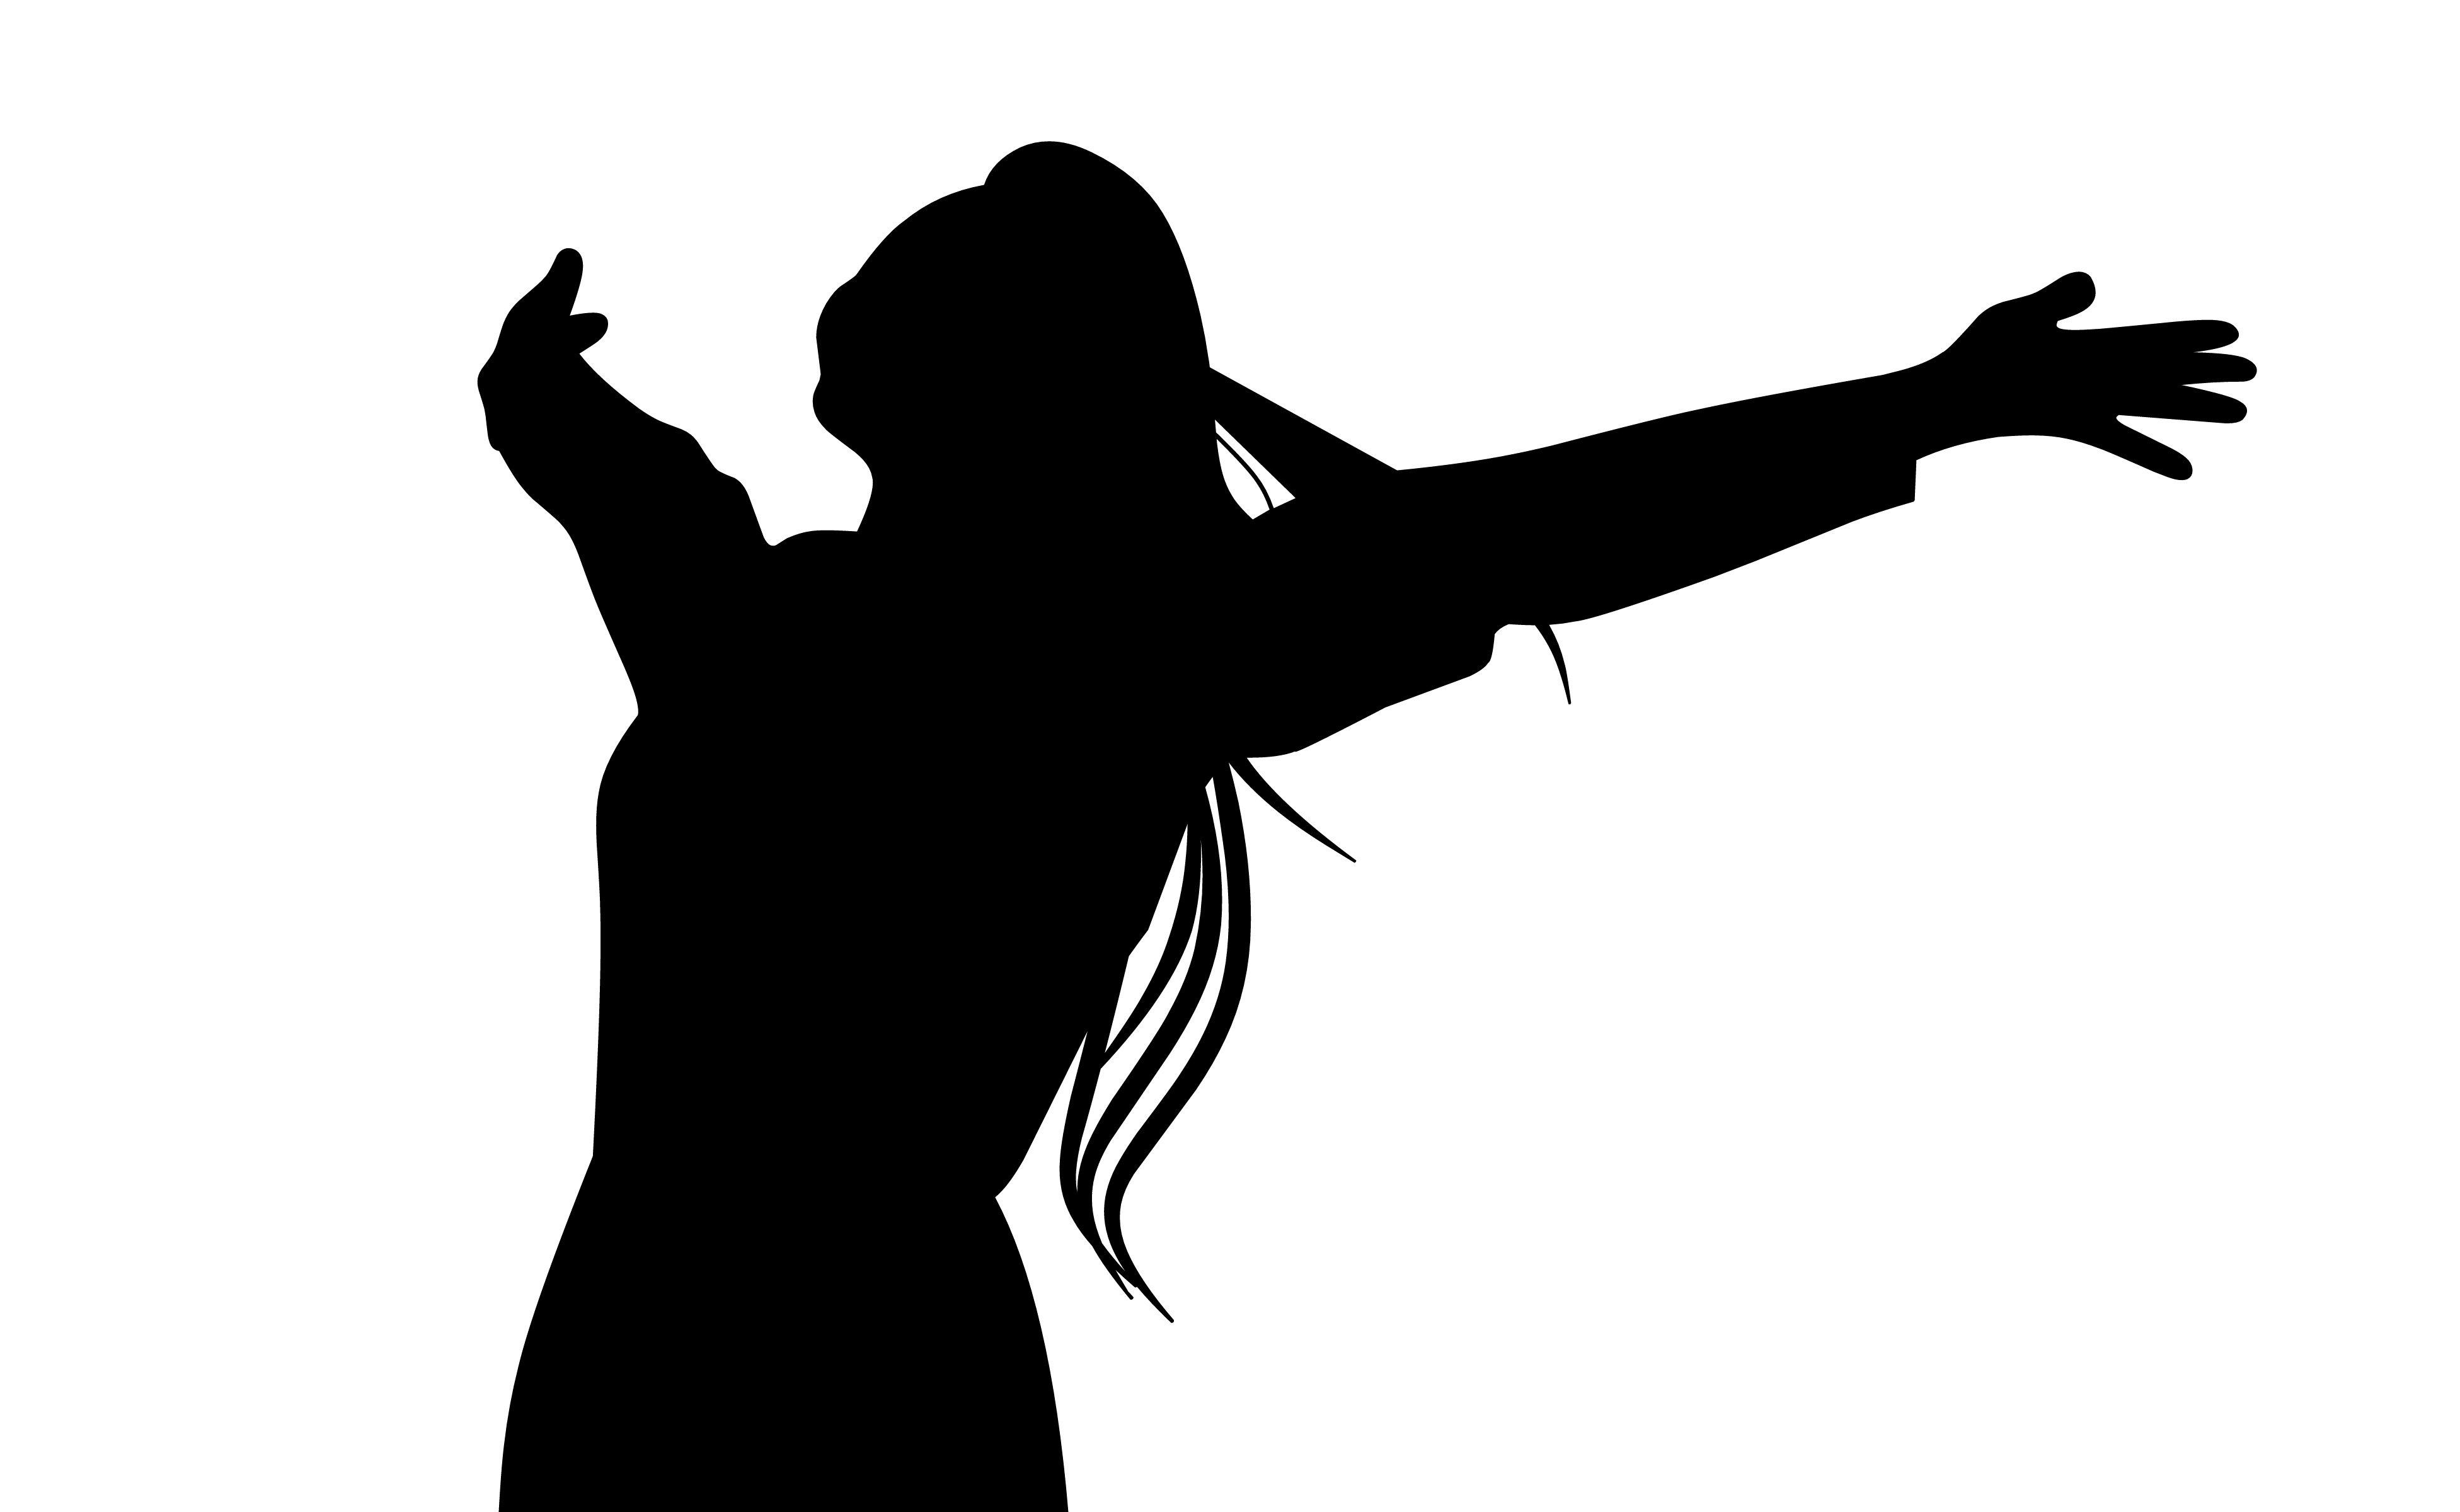 feel-free-Silhouette-joy-free-achievement-arm-boss-1444185-pxhere.com